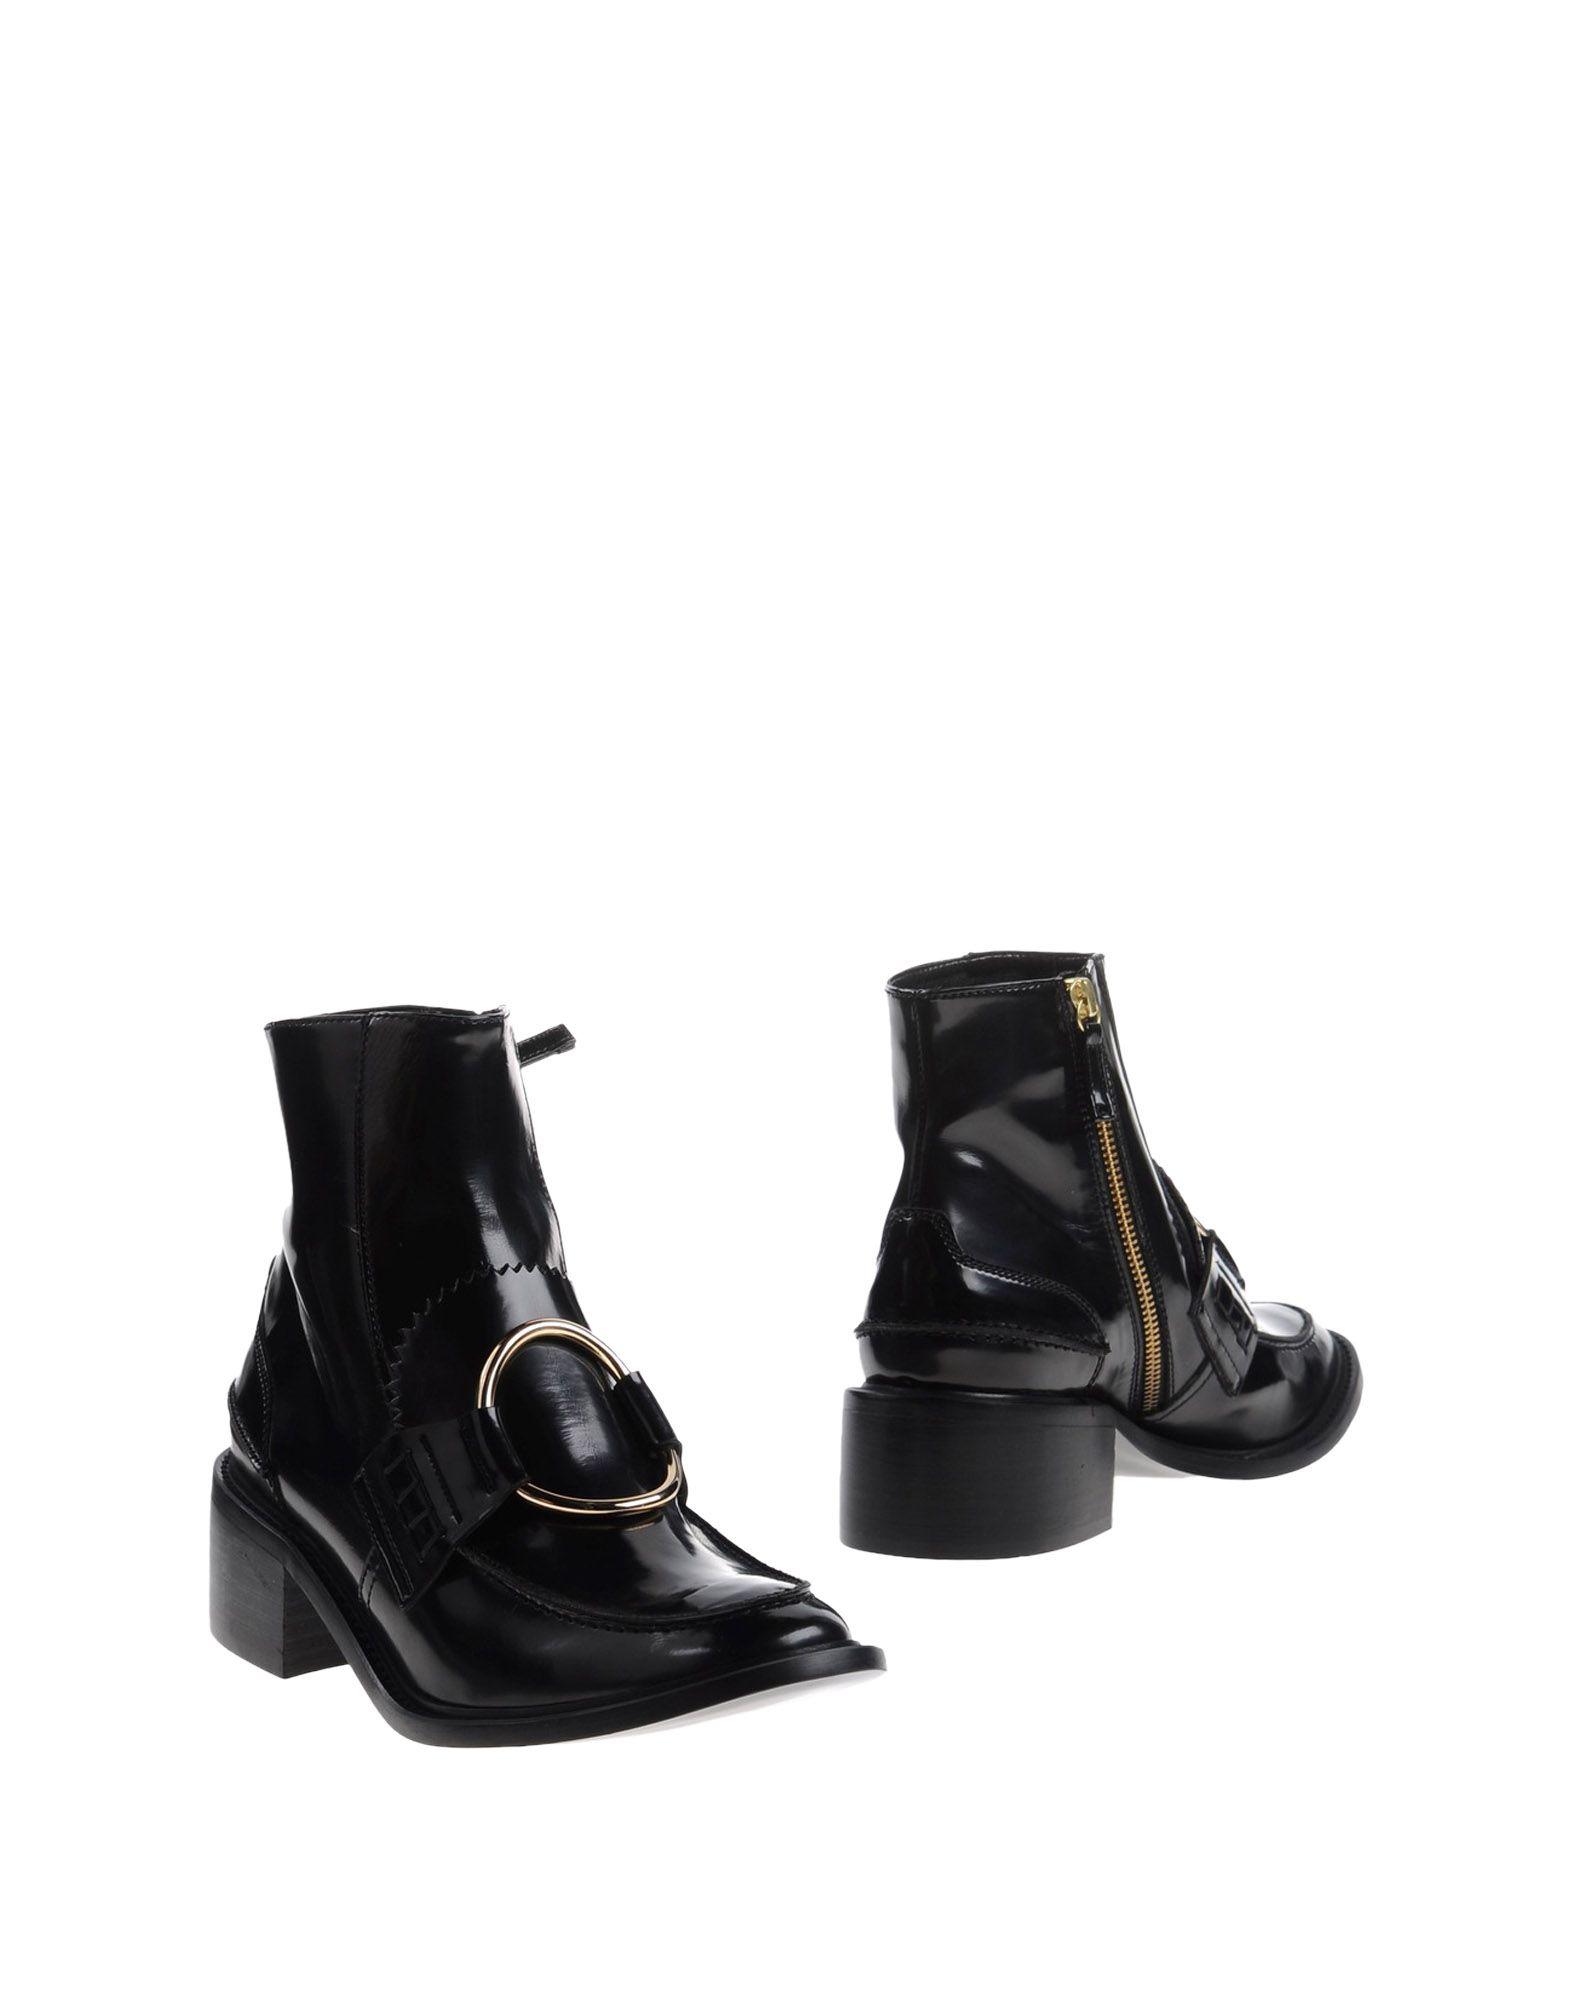 Stella Mccartney Stiefelette Damen  11004547SO Beliebte Schuhe